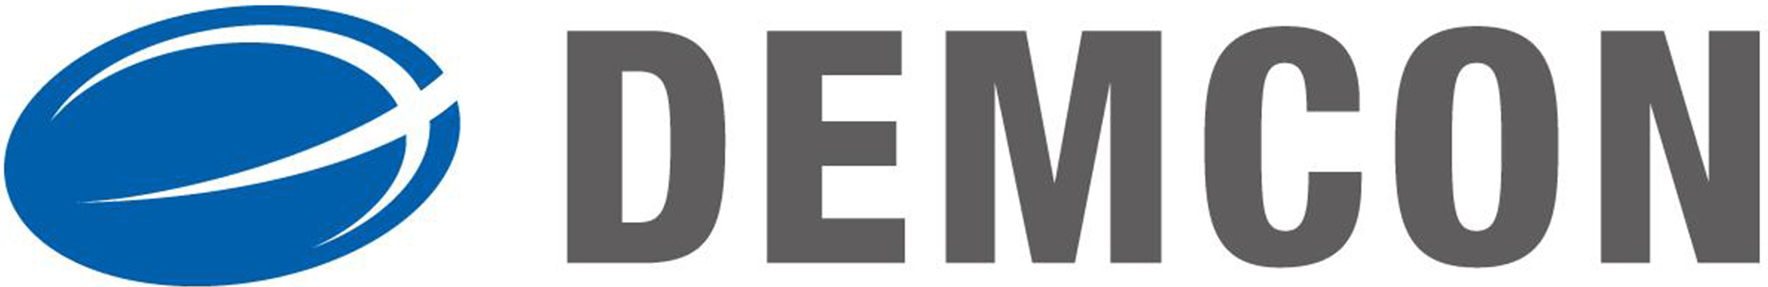 Demcon logo Metalfinish Group